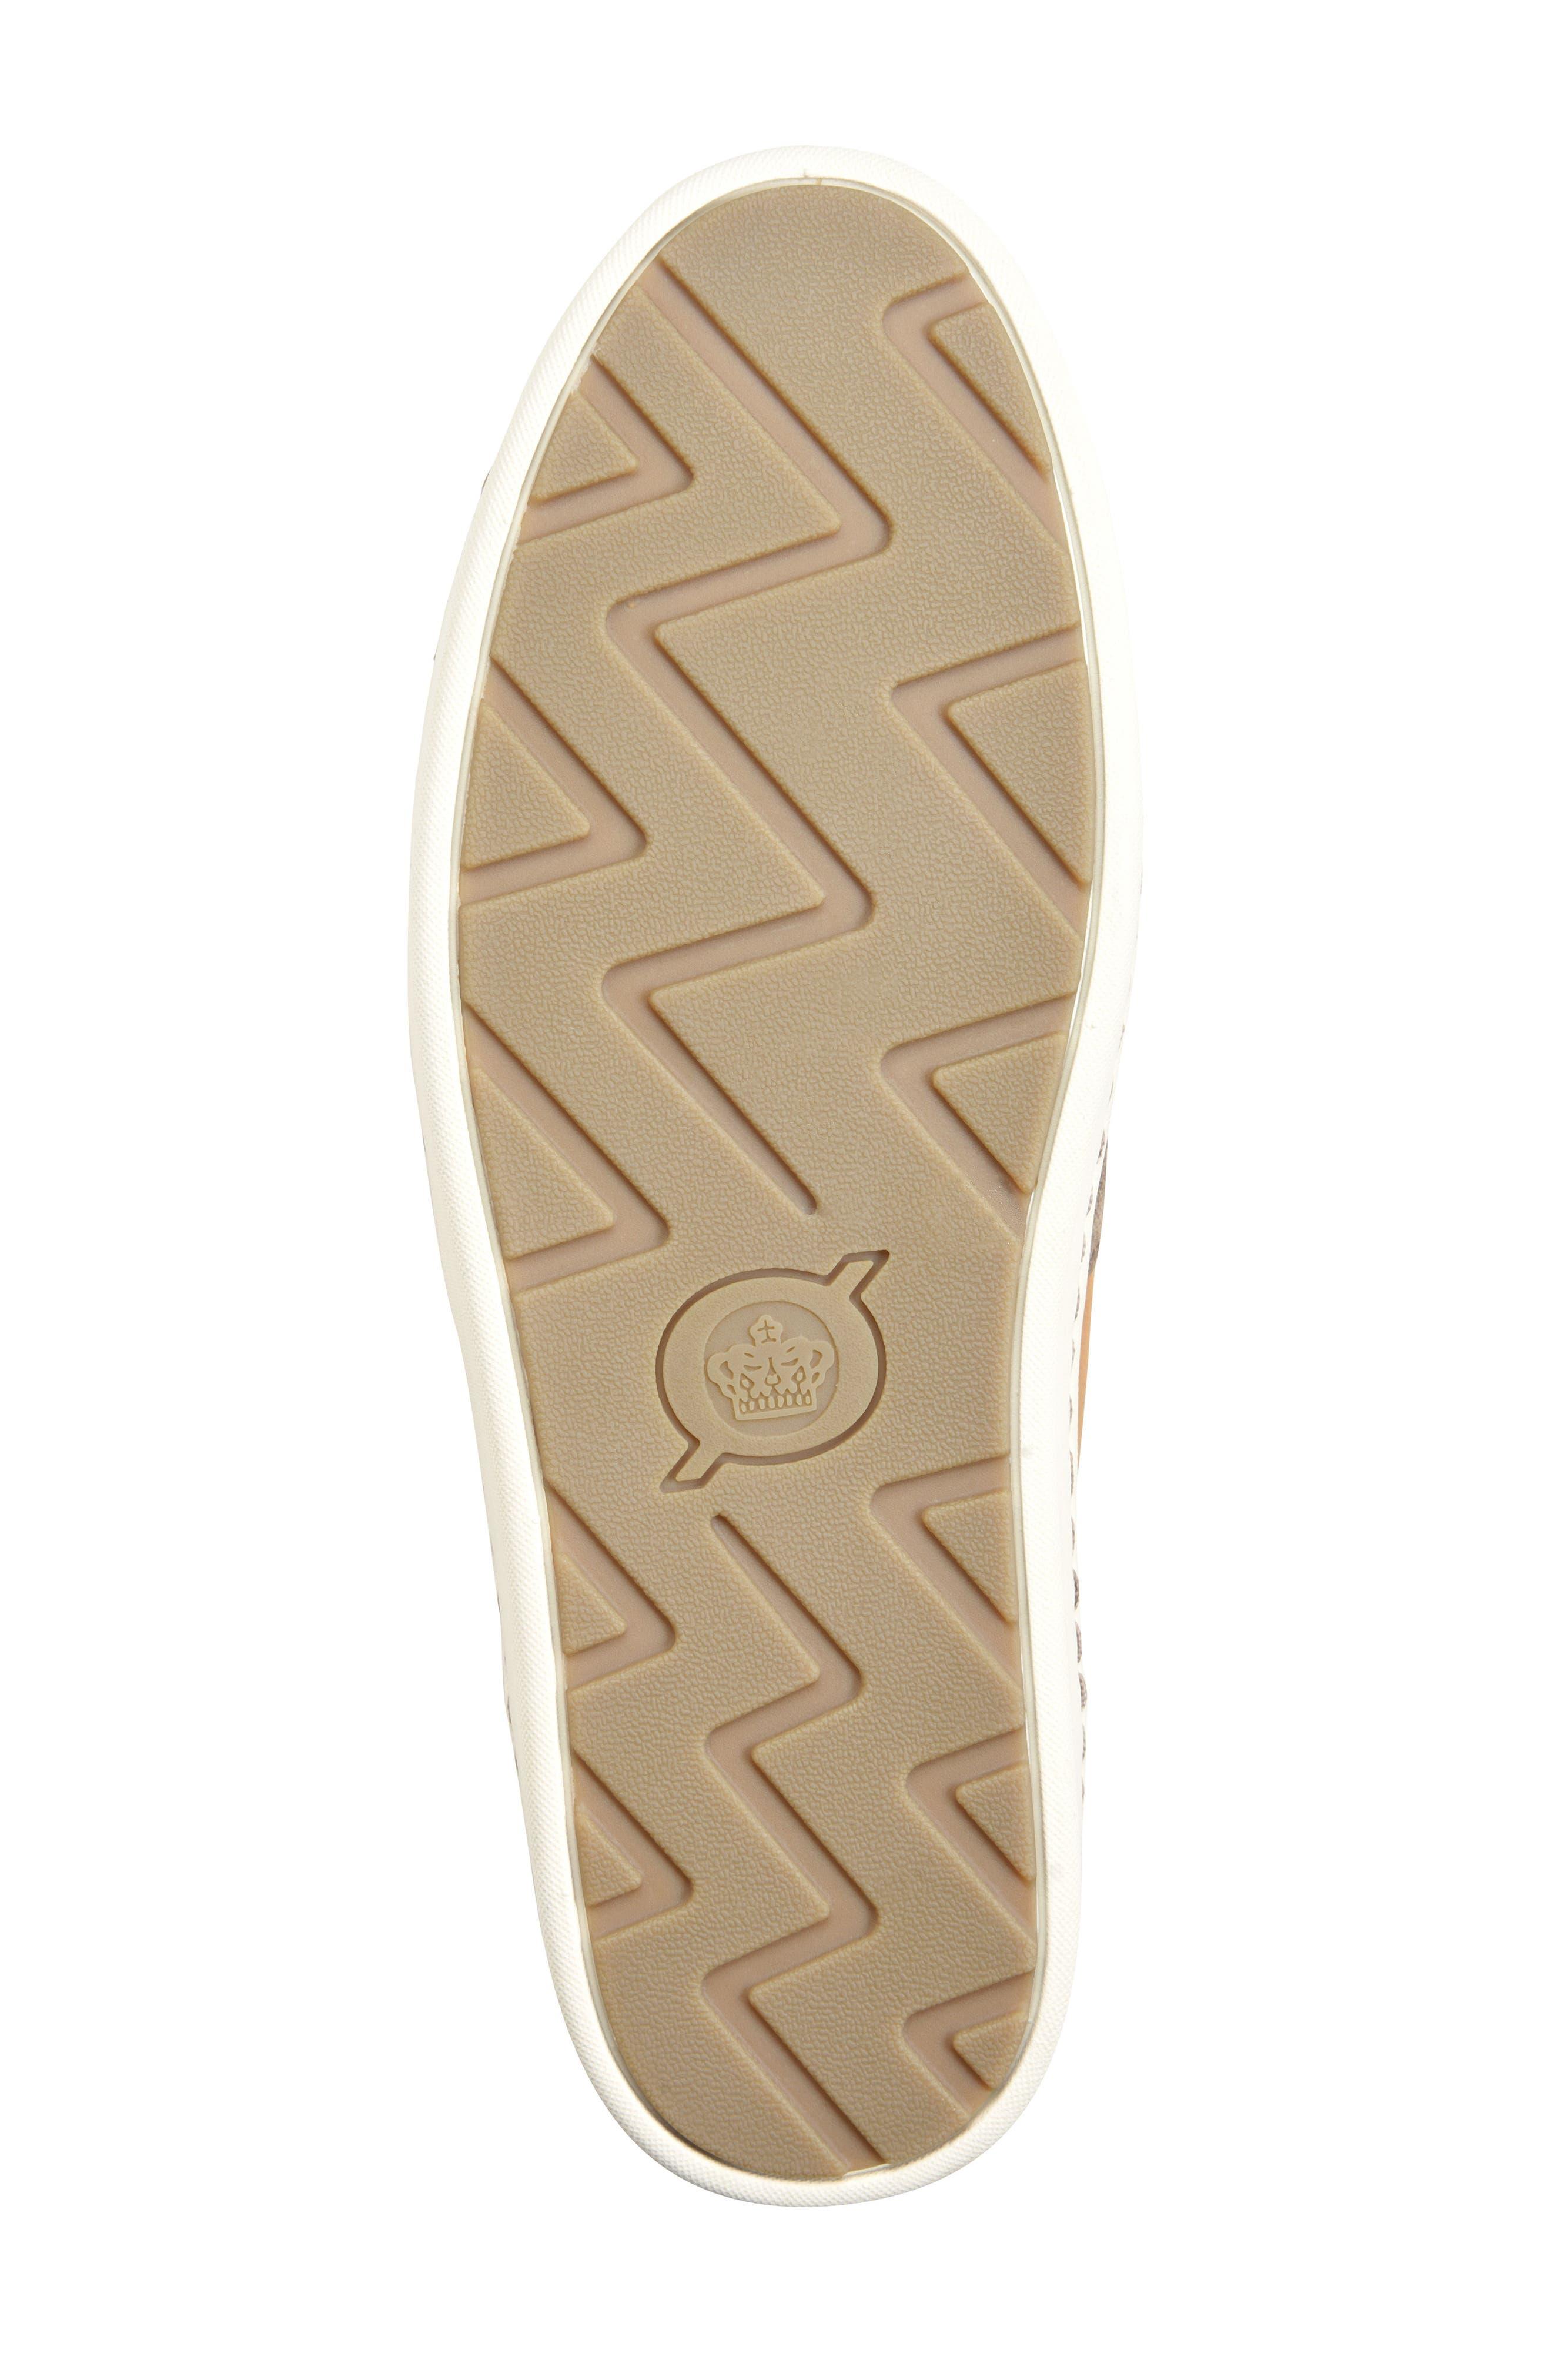 Keystone Low Top Sneaker,                             Alternate thumbnail 17, color,